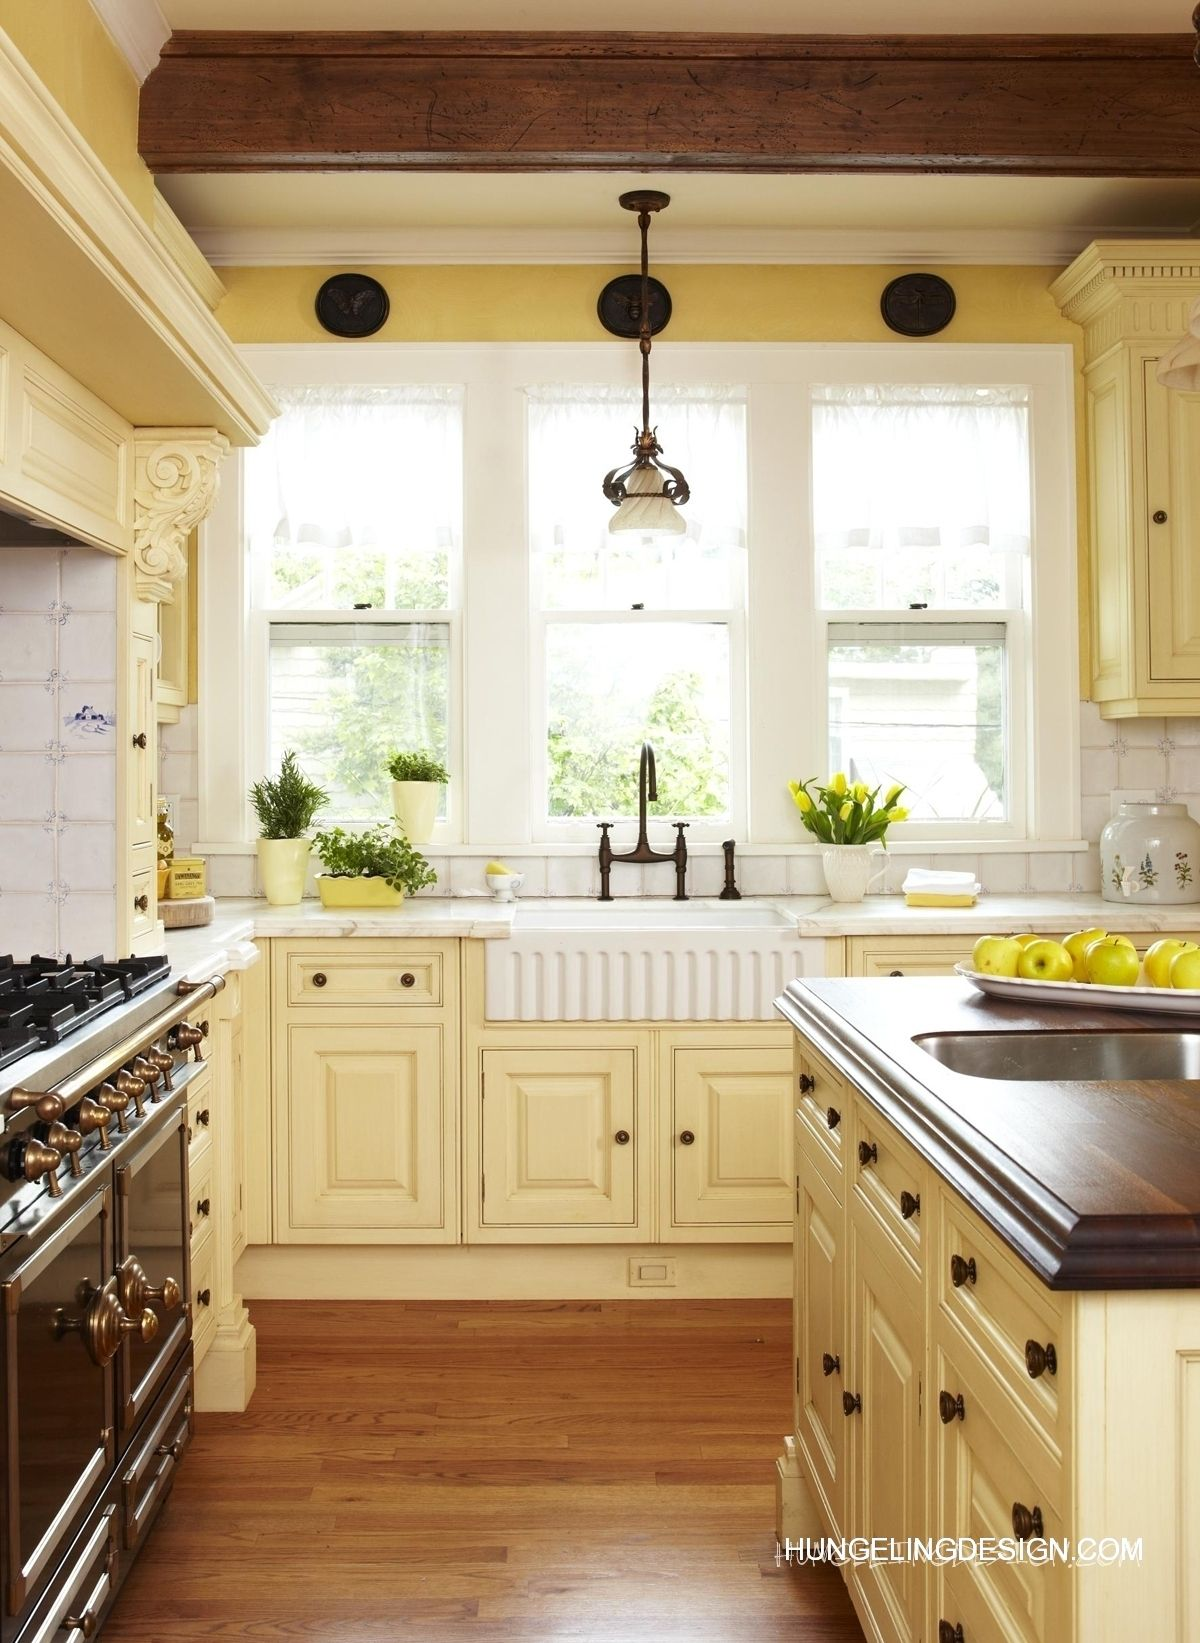 kitchen knoxville tnhungeling luxury kitchen design clive christian beautiful kitchen on kitchen interior yellow and white id=59920